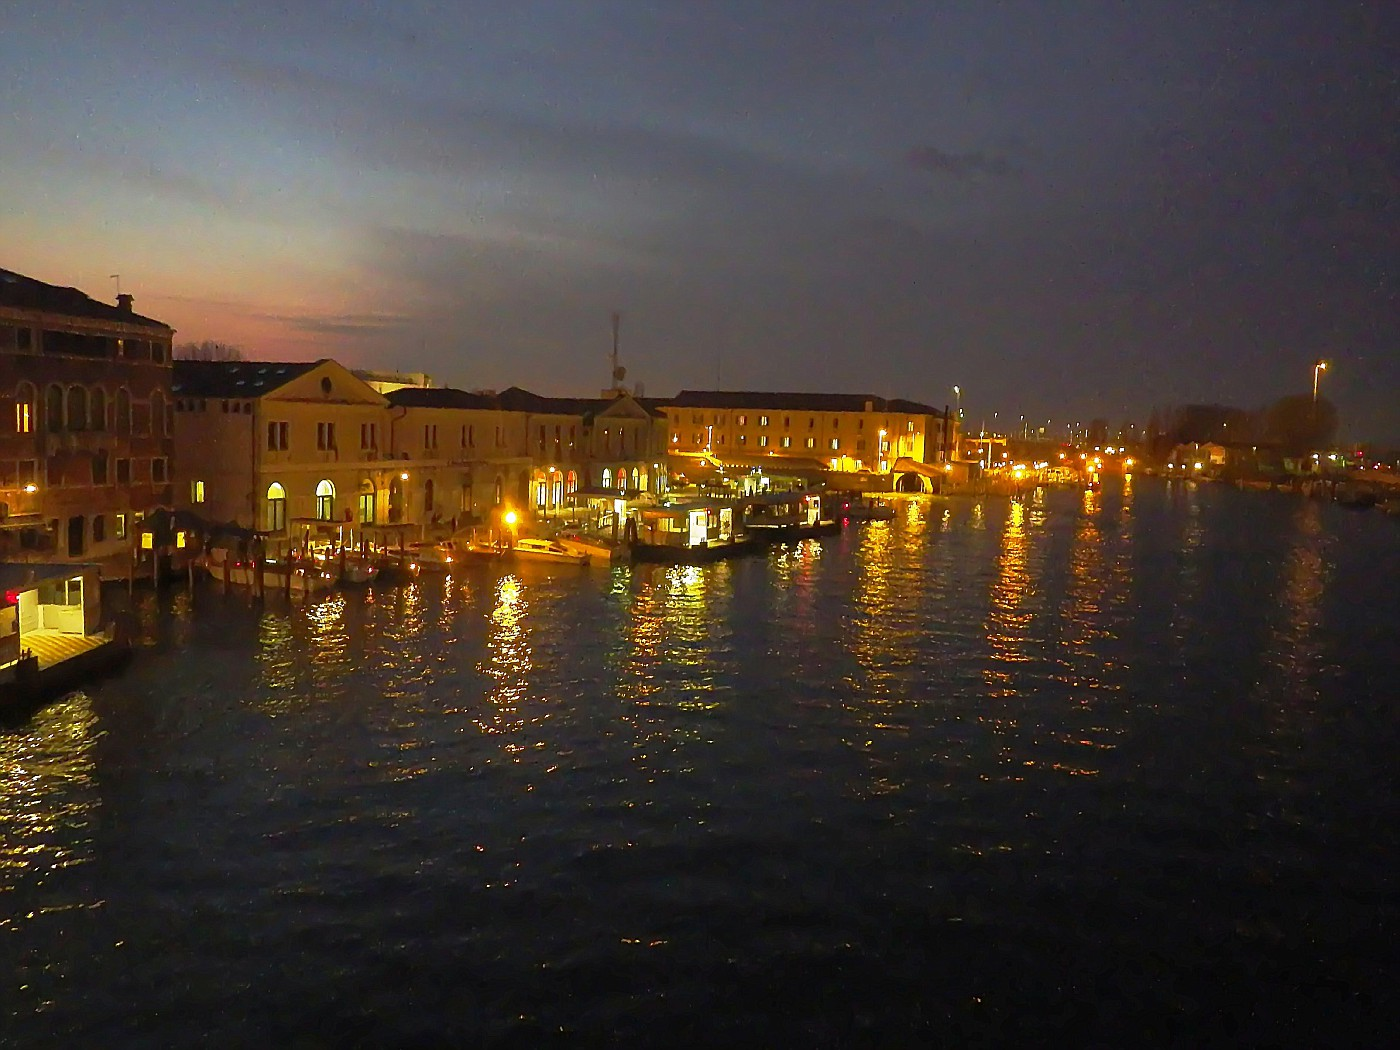 Canale di notte